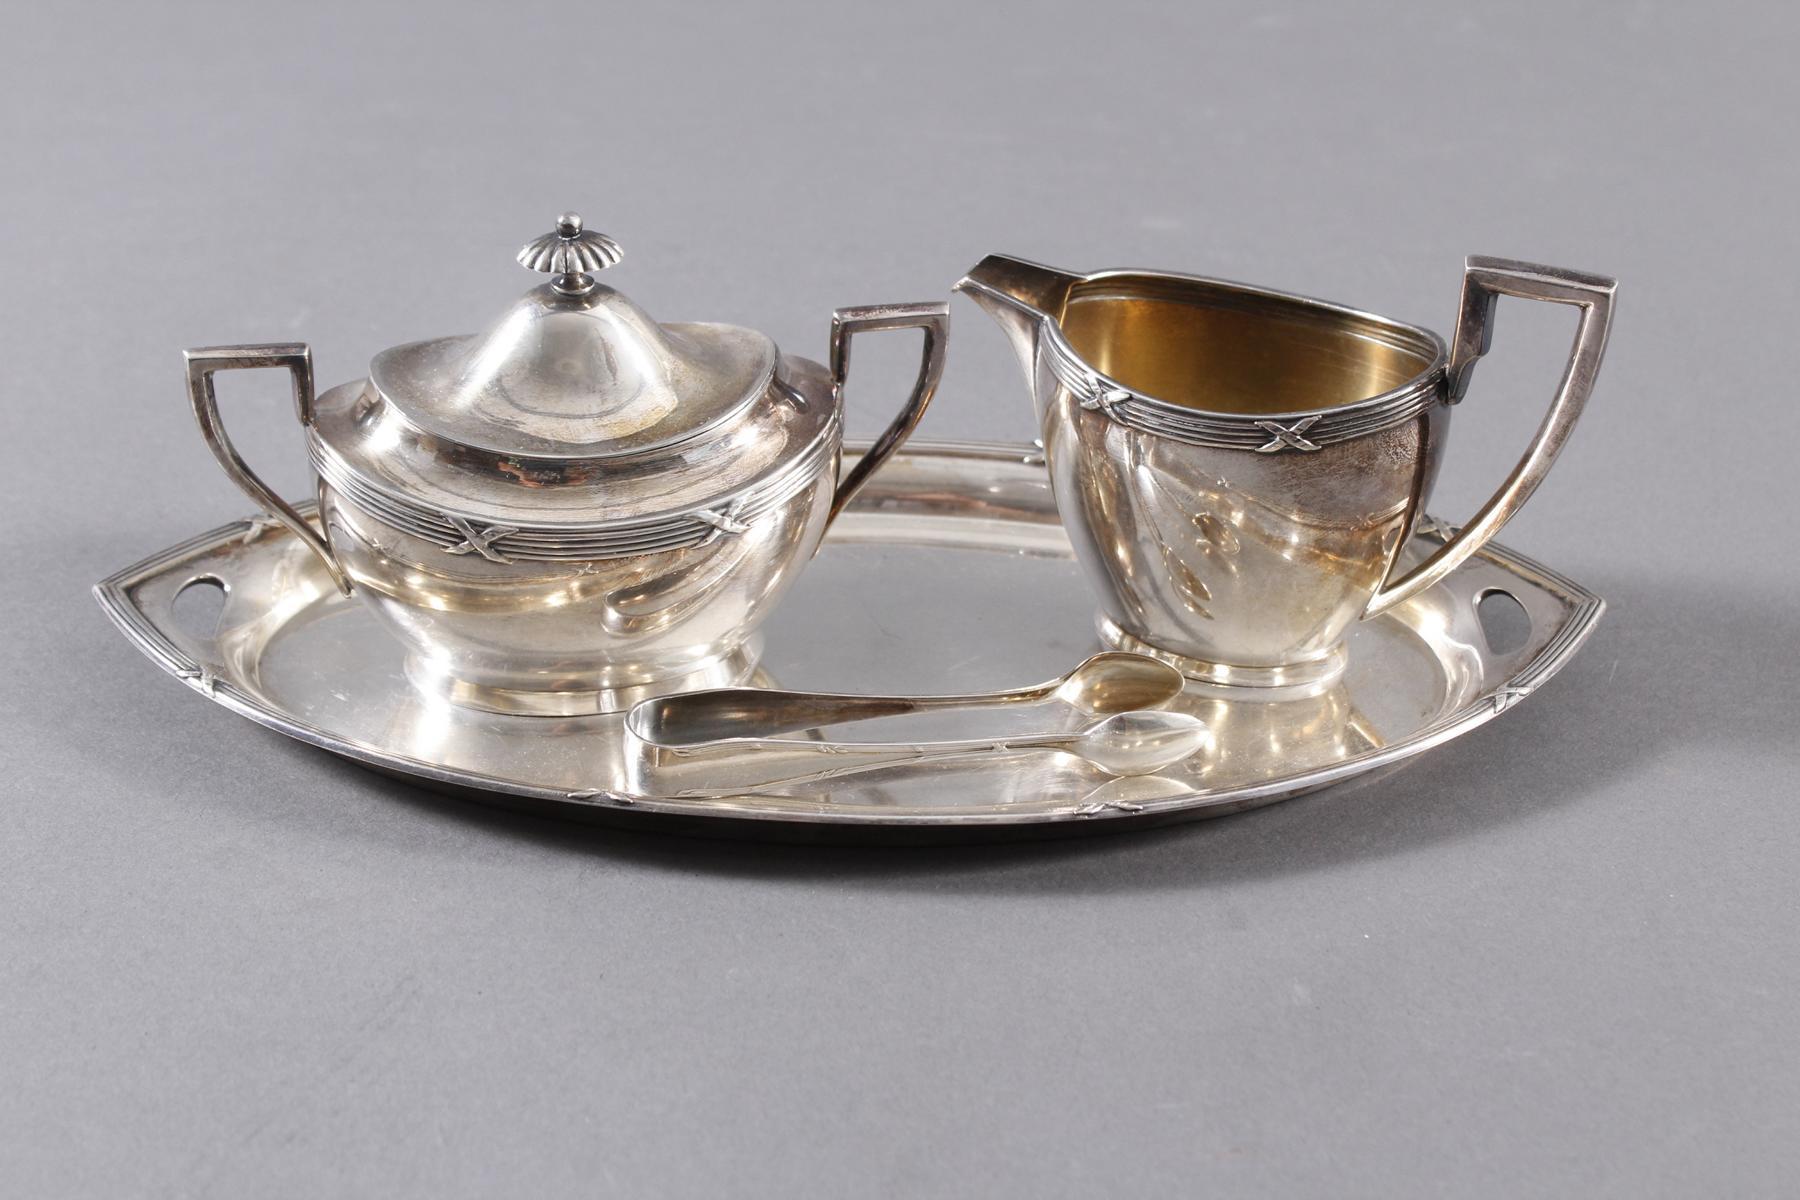 Silberset, 4-teilig, Wilhelm Binder Silber 800